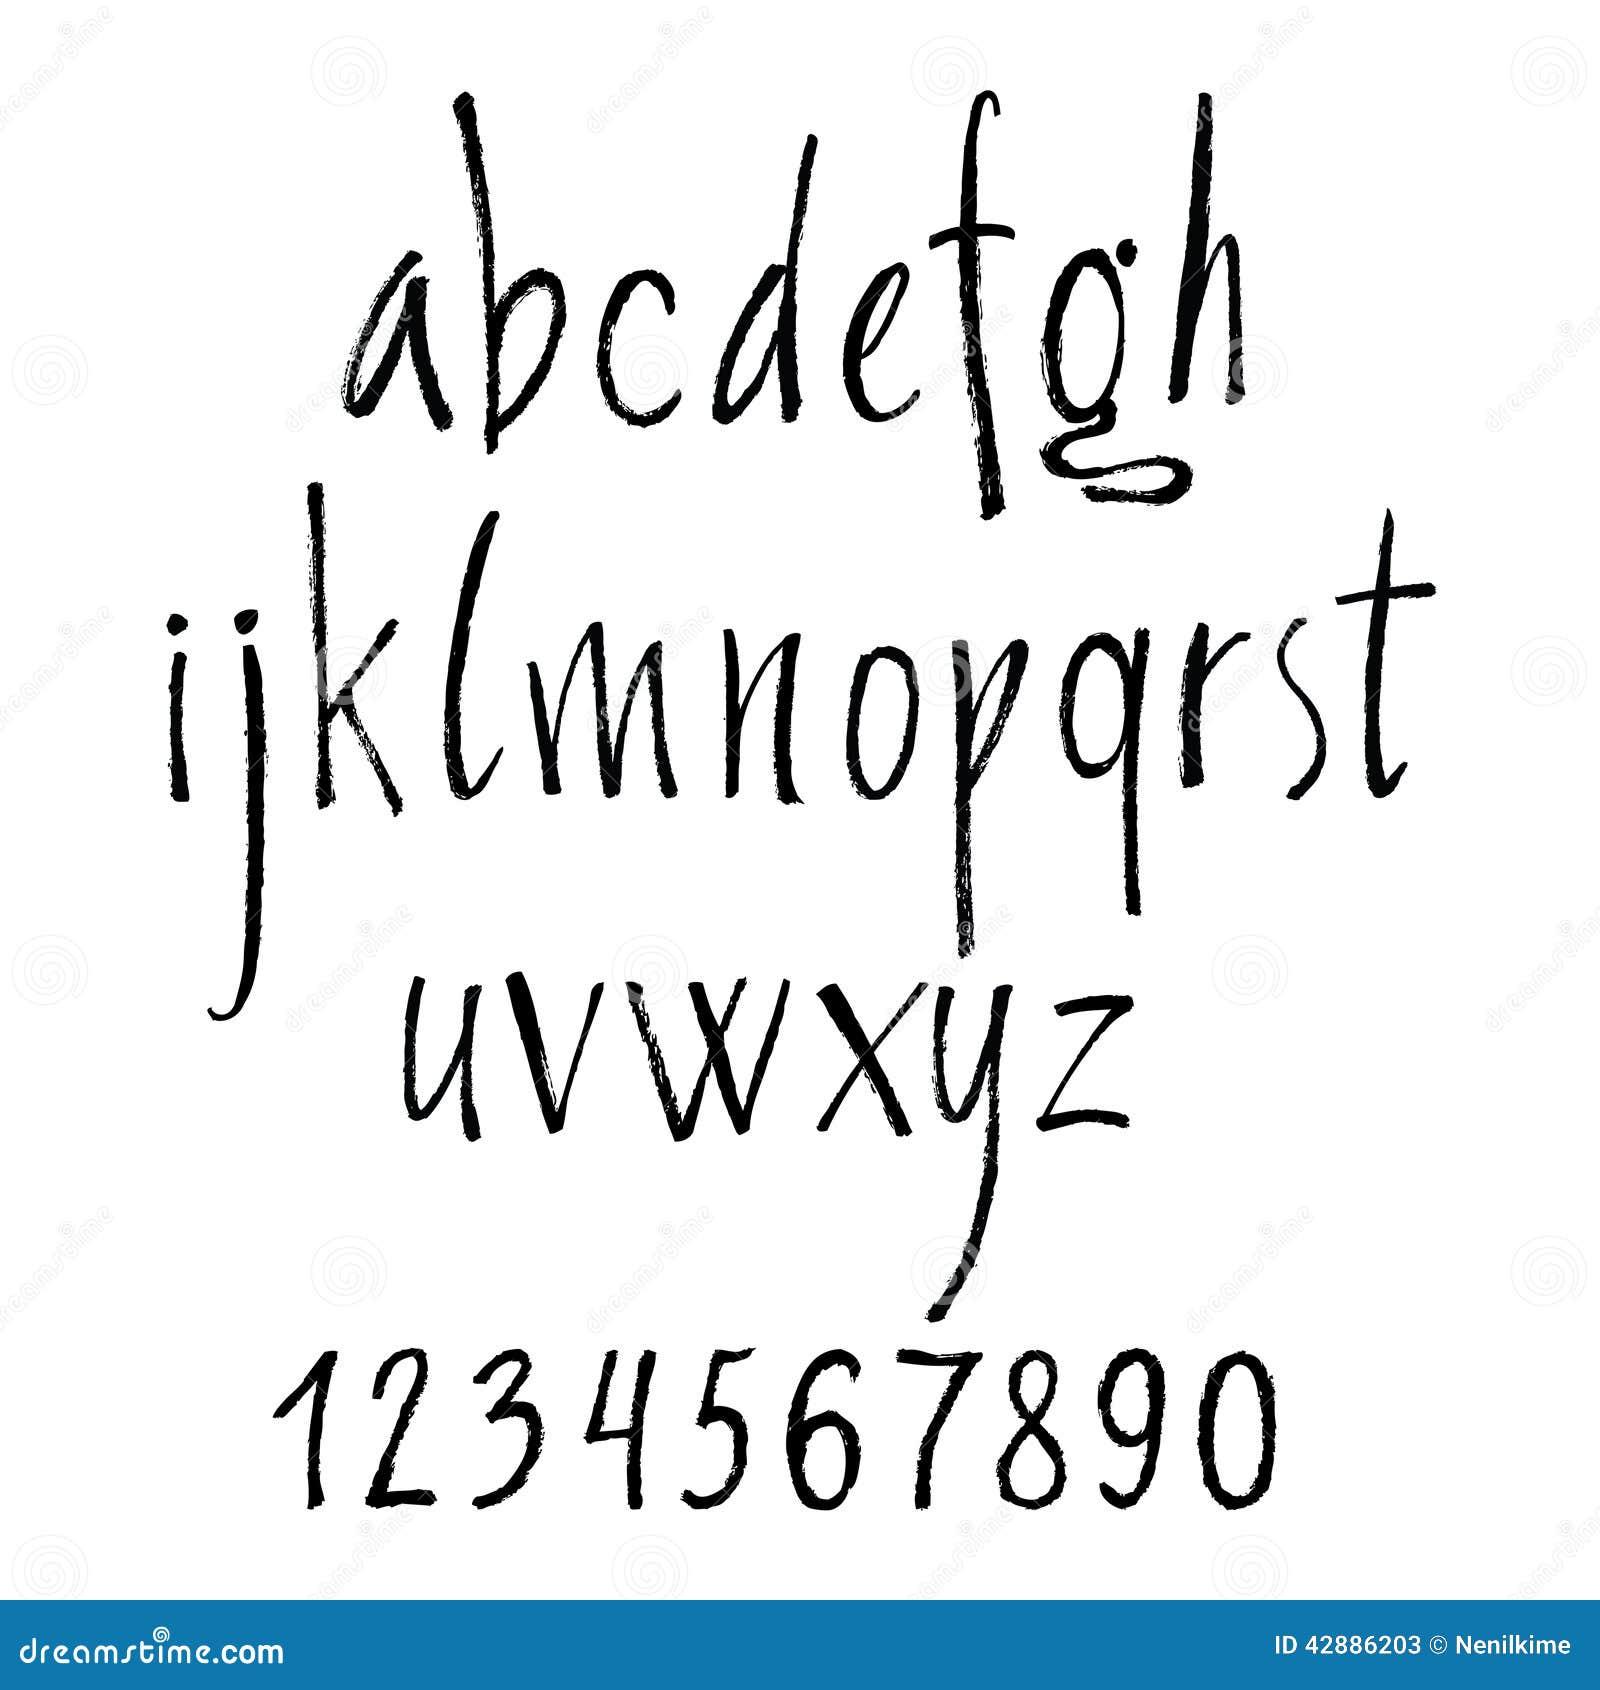 Handwritten Calligraphic Letters Of The Alphabet Written ...